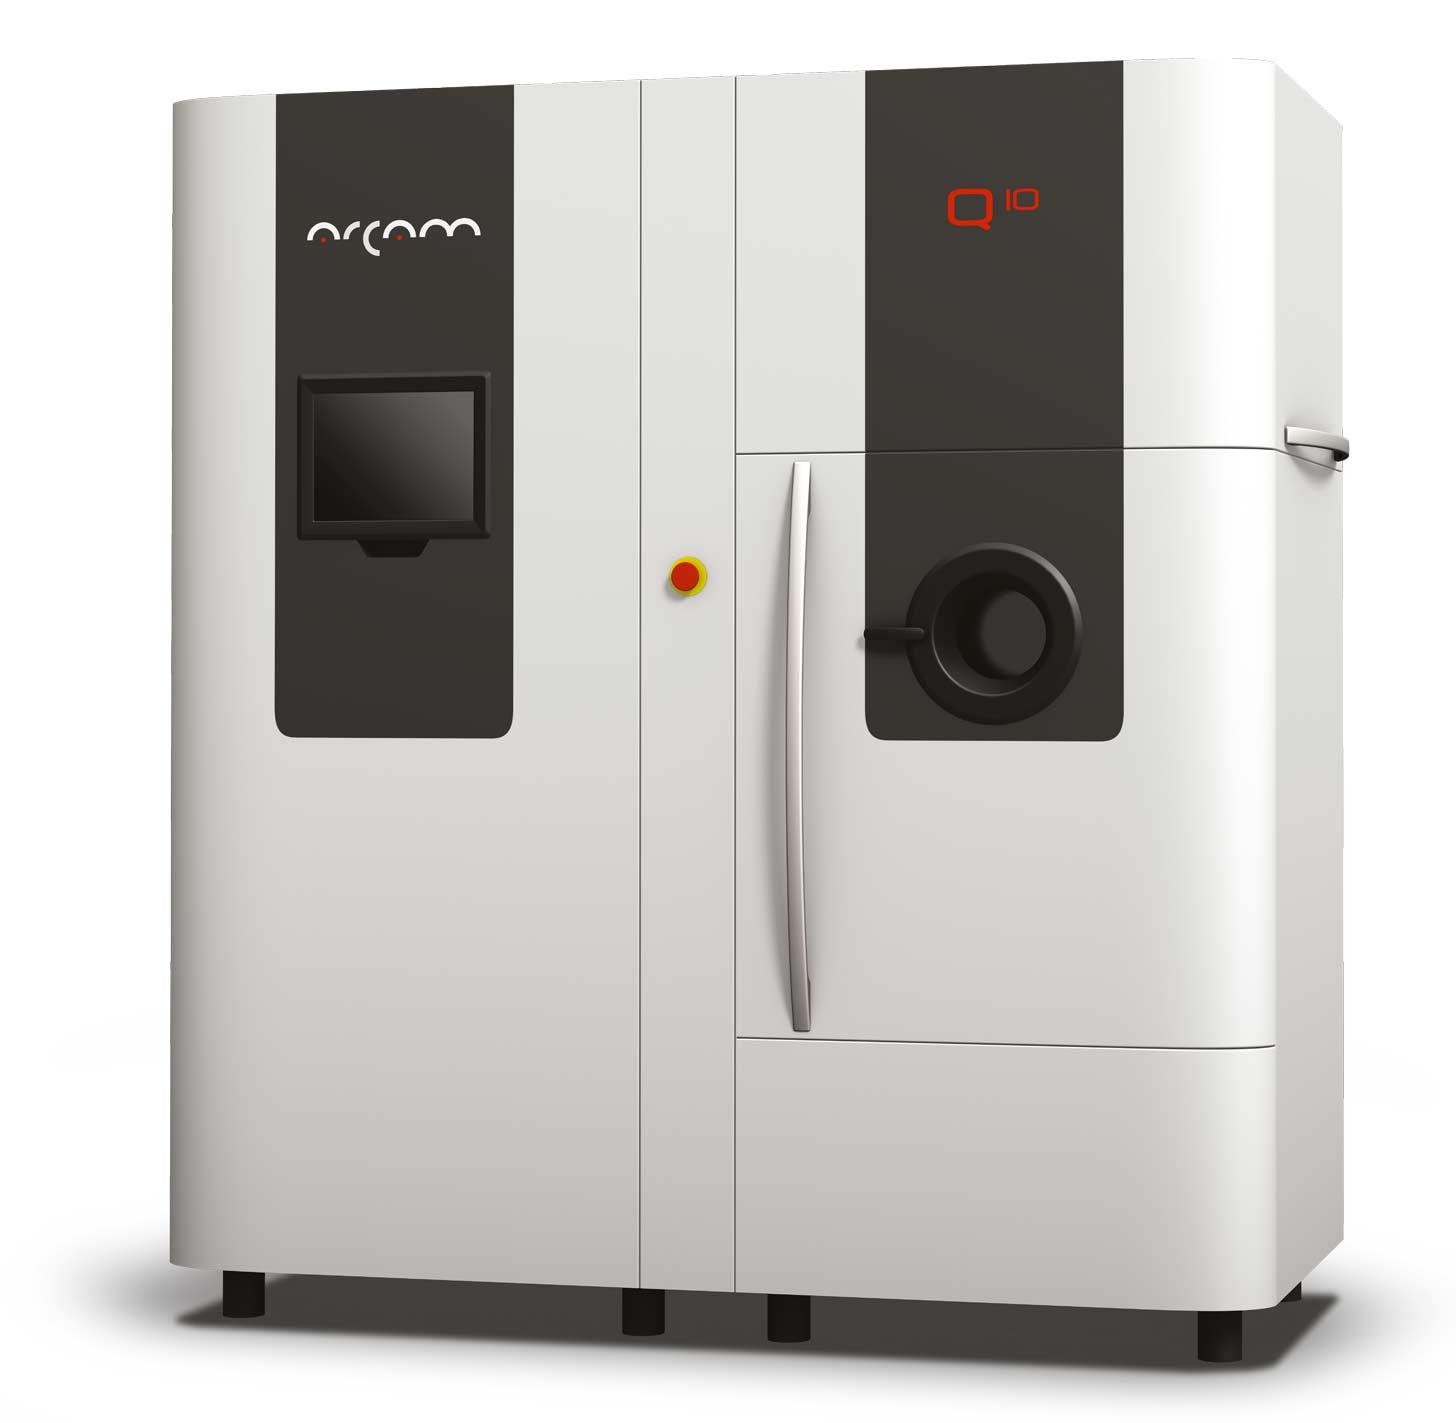 q10-machine